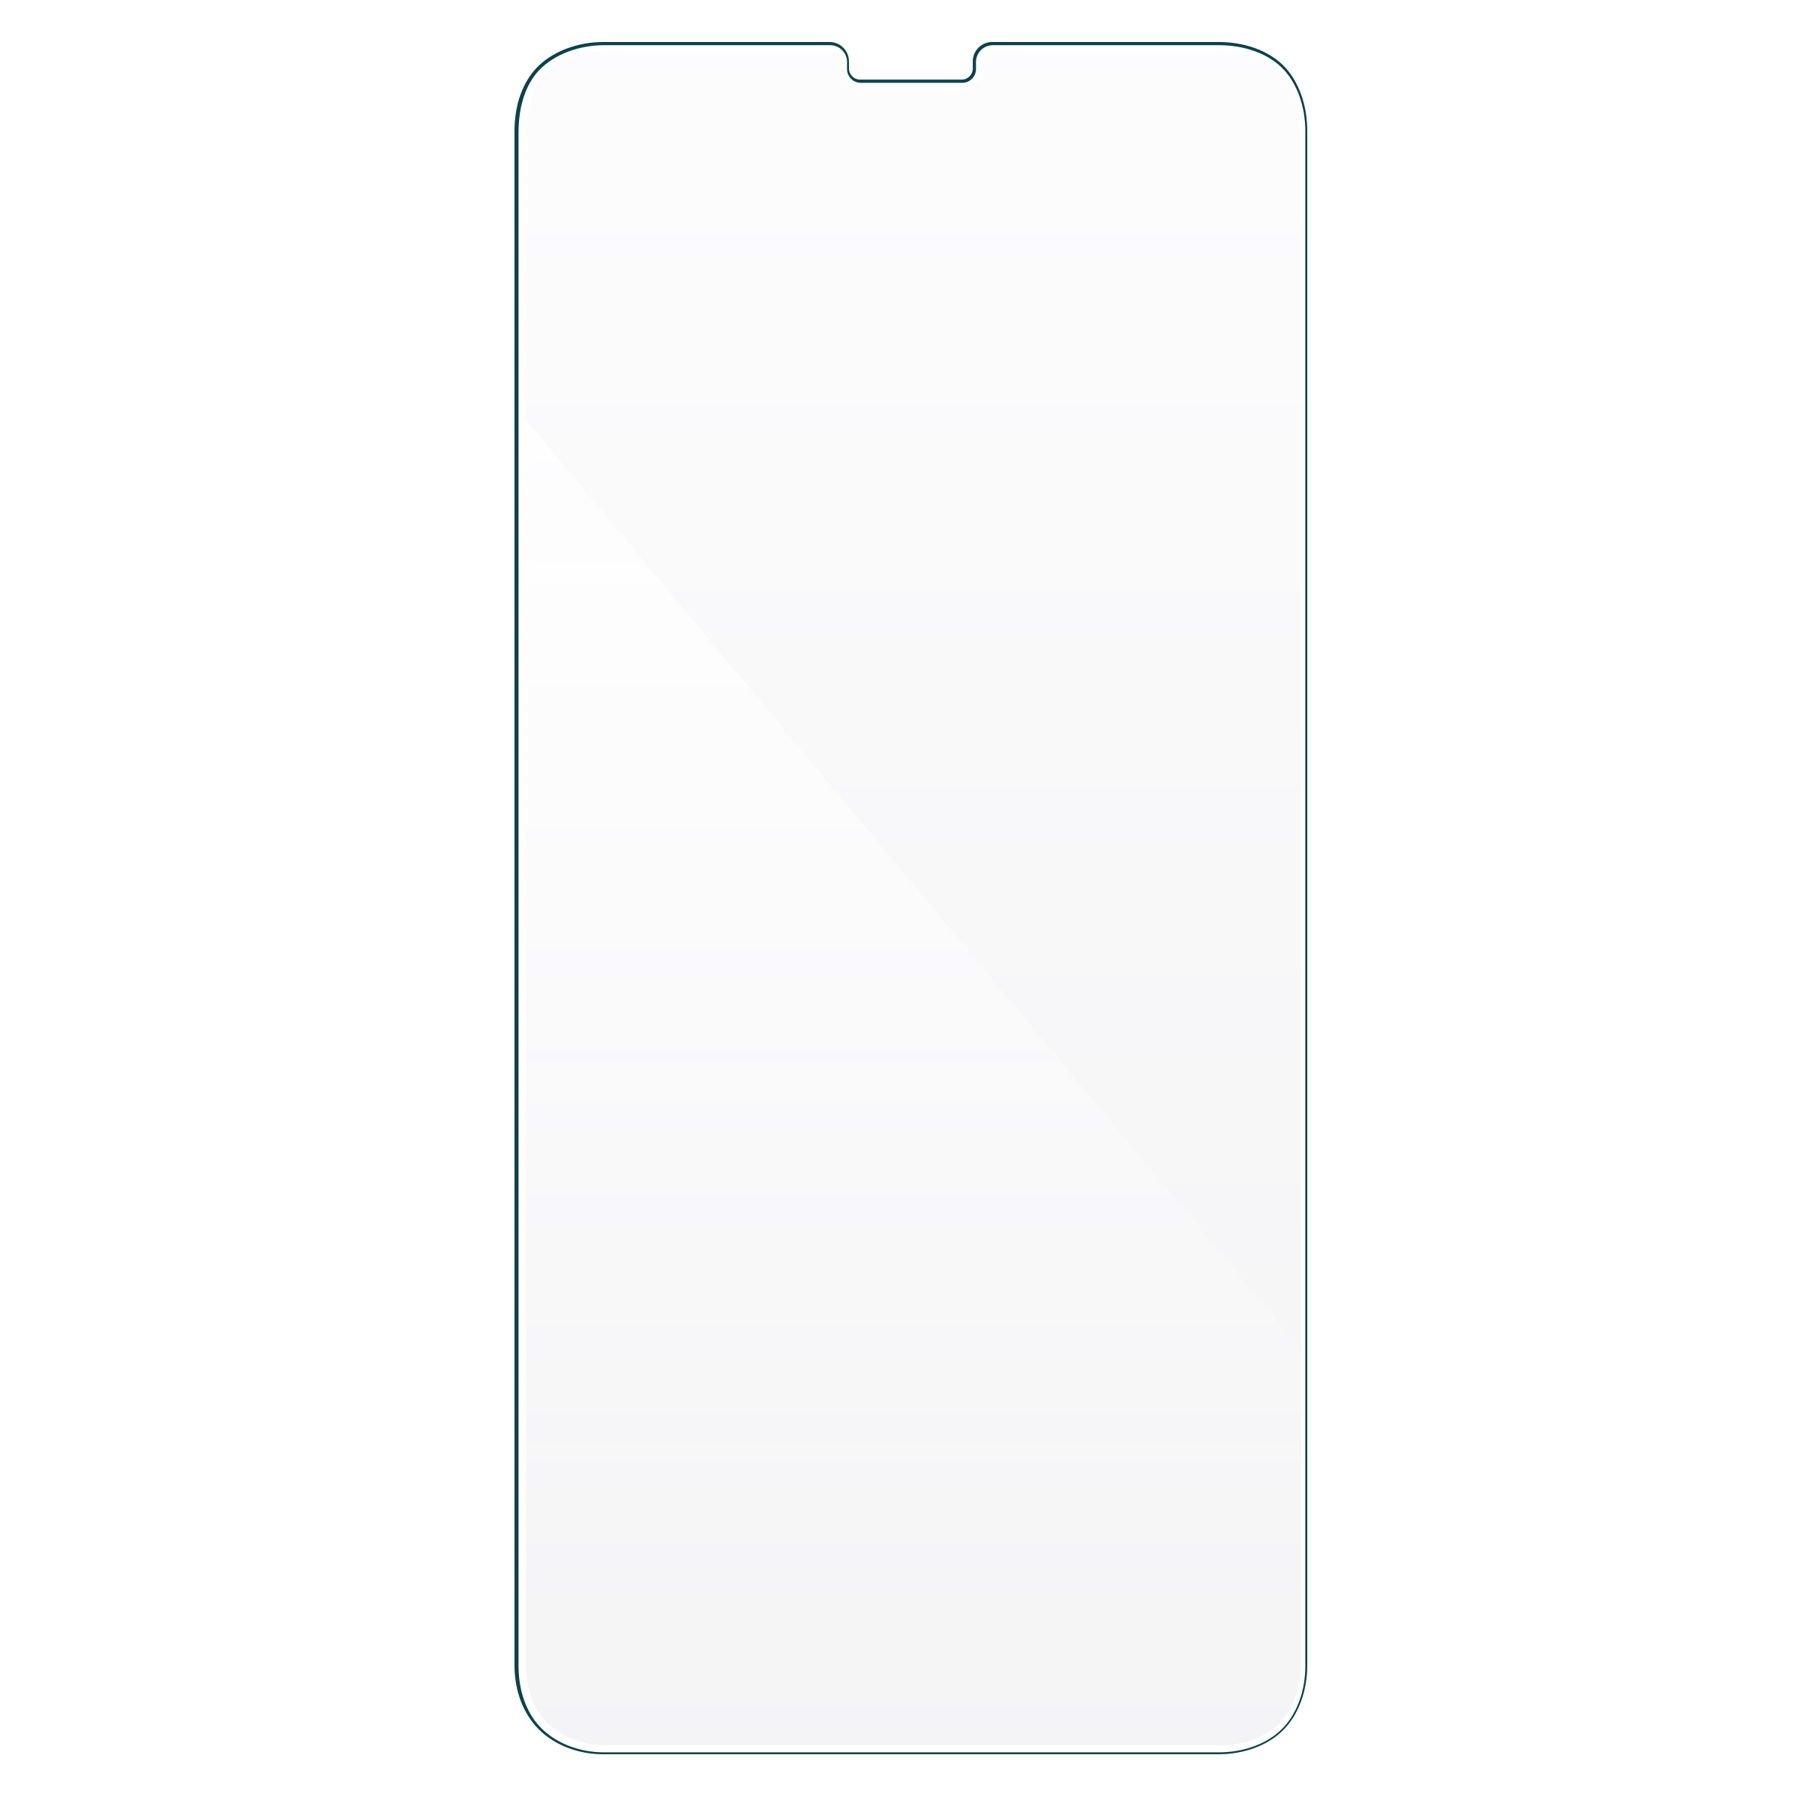 Zestaw moVear Etui flipSide S (skórzane) + Szkło Hartowane 2.5D | iPhone X/Xs